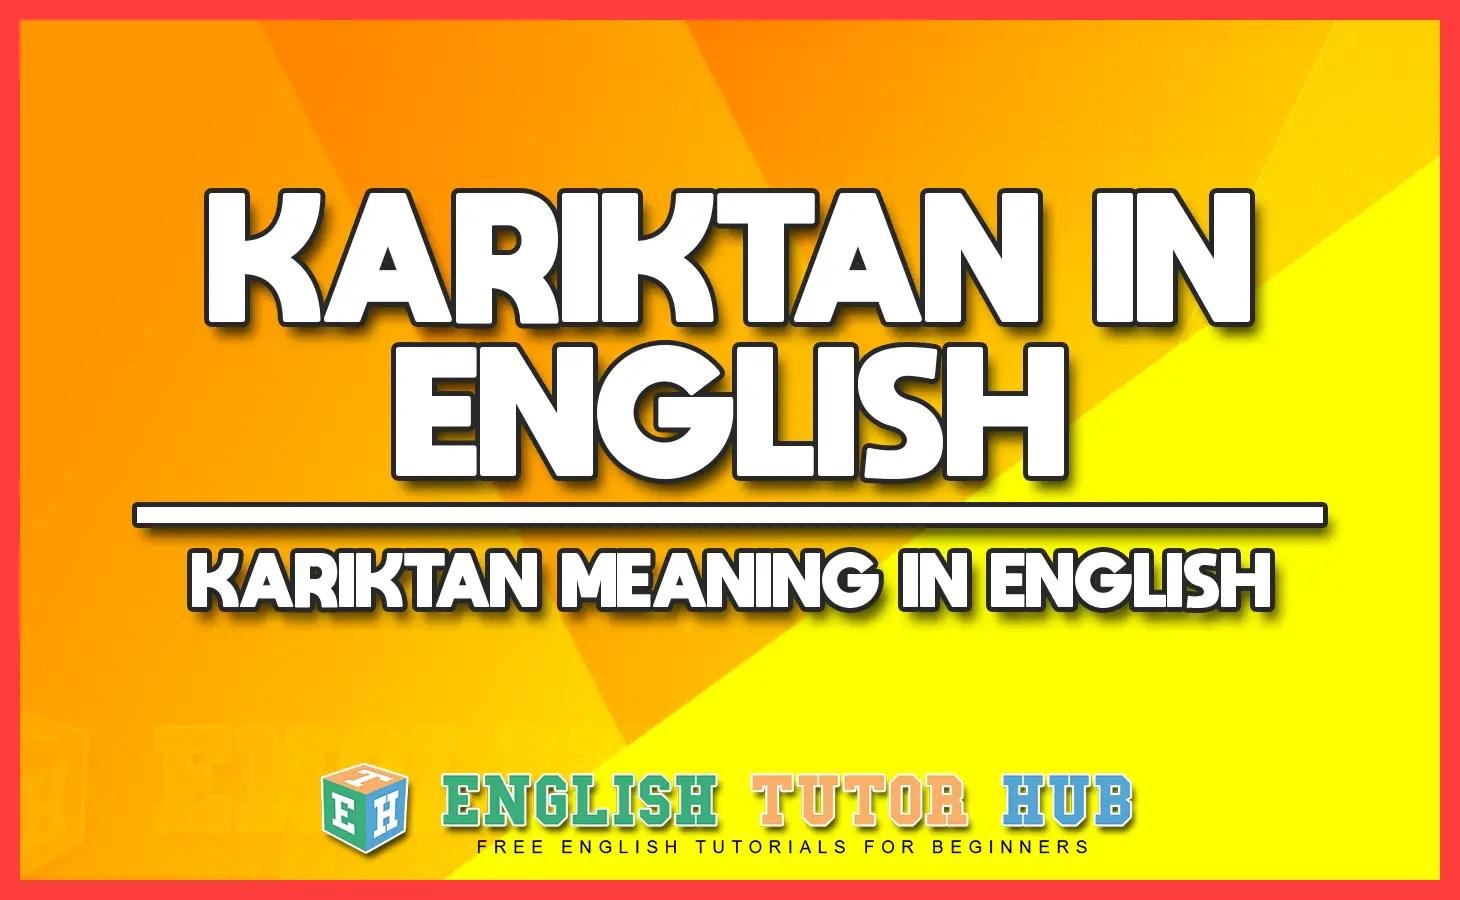 KARIKTAN IN ENGLISH - KARIKTAN MEANING IN ENGLISH